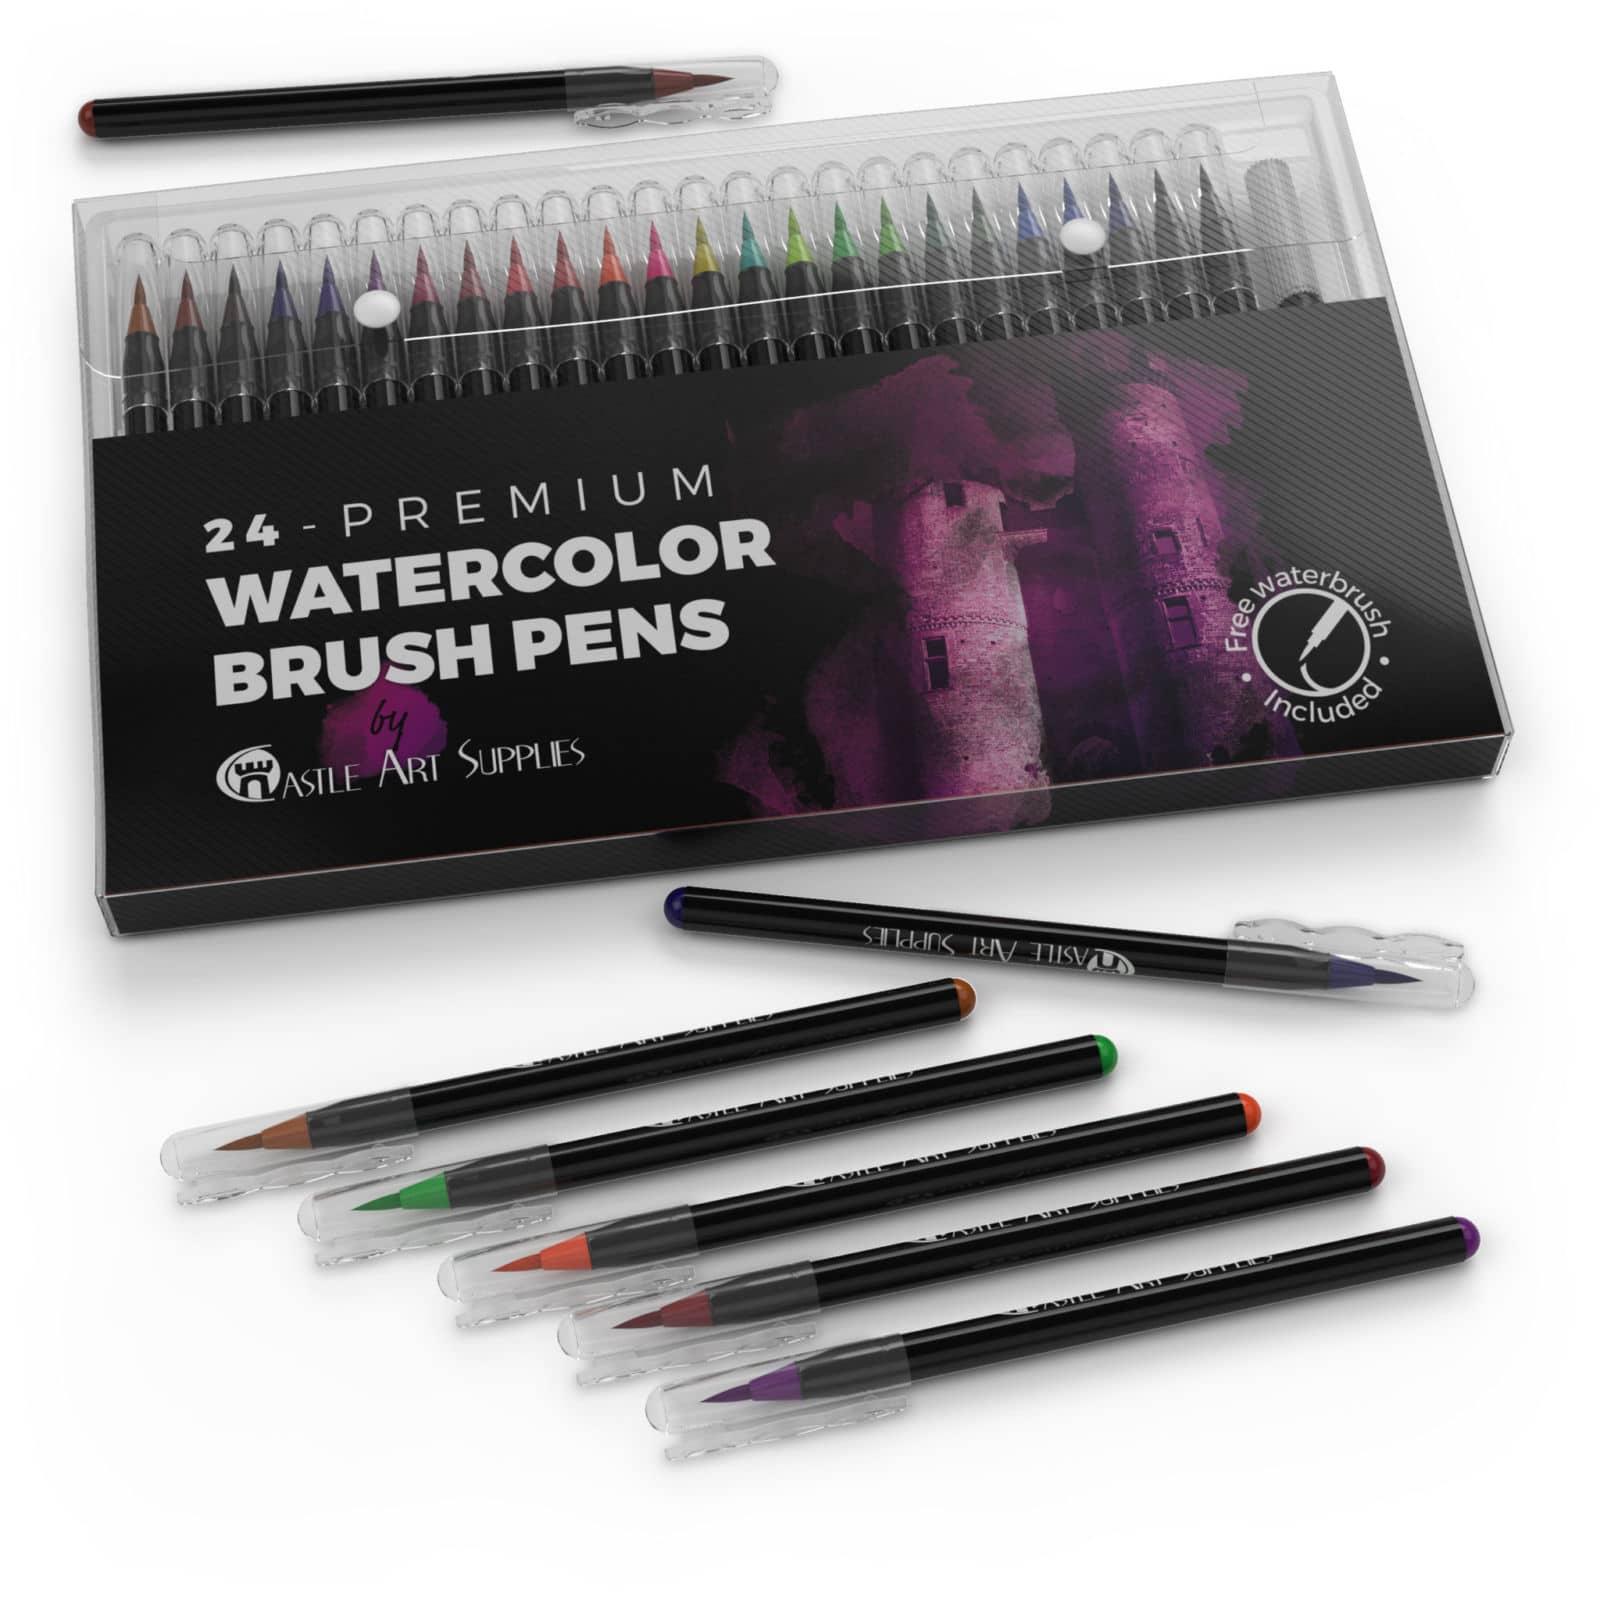 Castle Art Supplies Waterbrush Pens